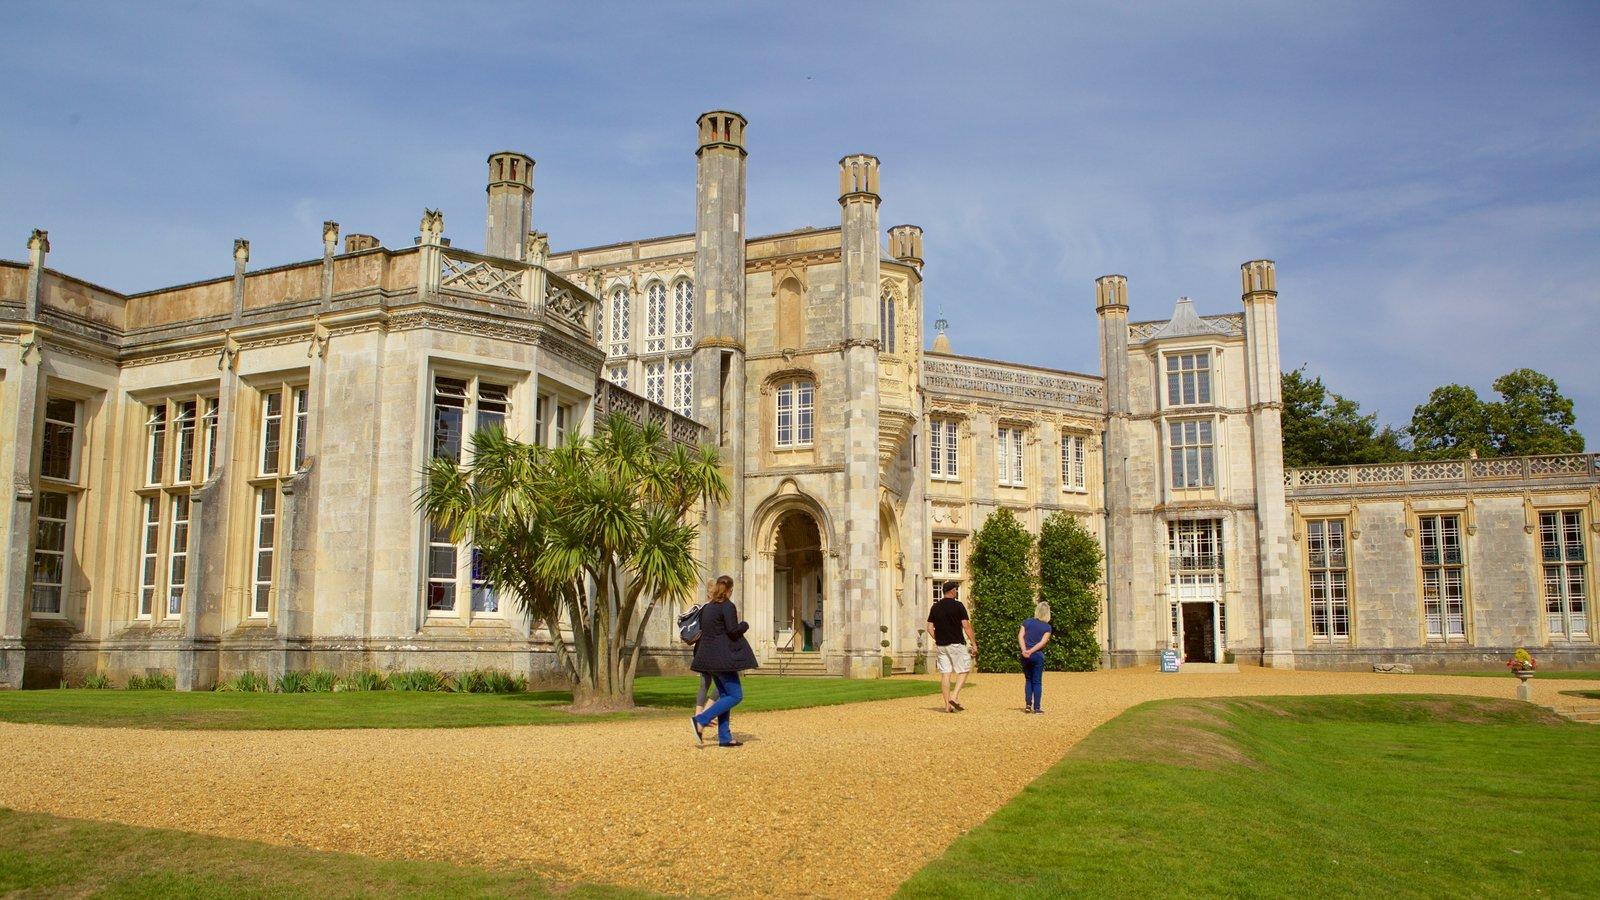 Highcliffe Castle caracterizando arquitetura de patrimônio, elementos de patrimônio e um jardim